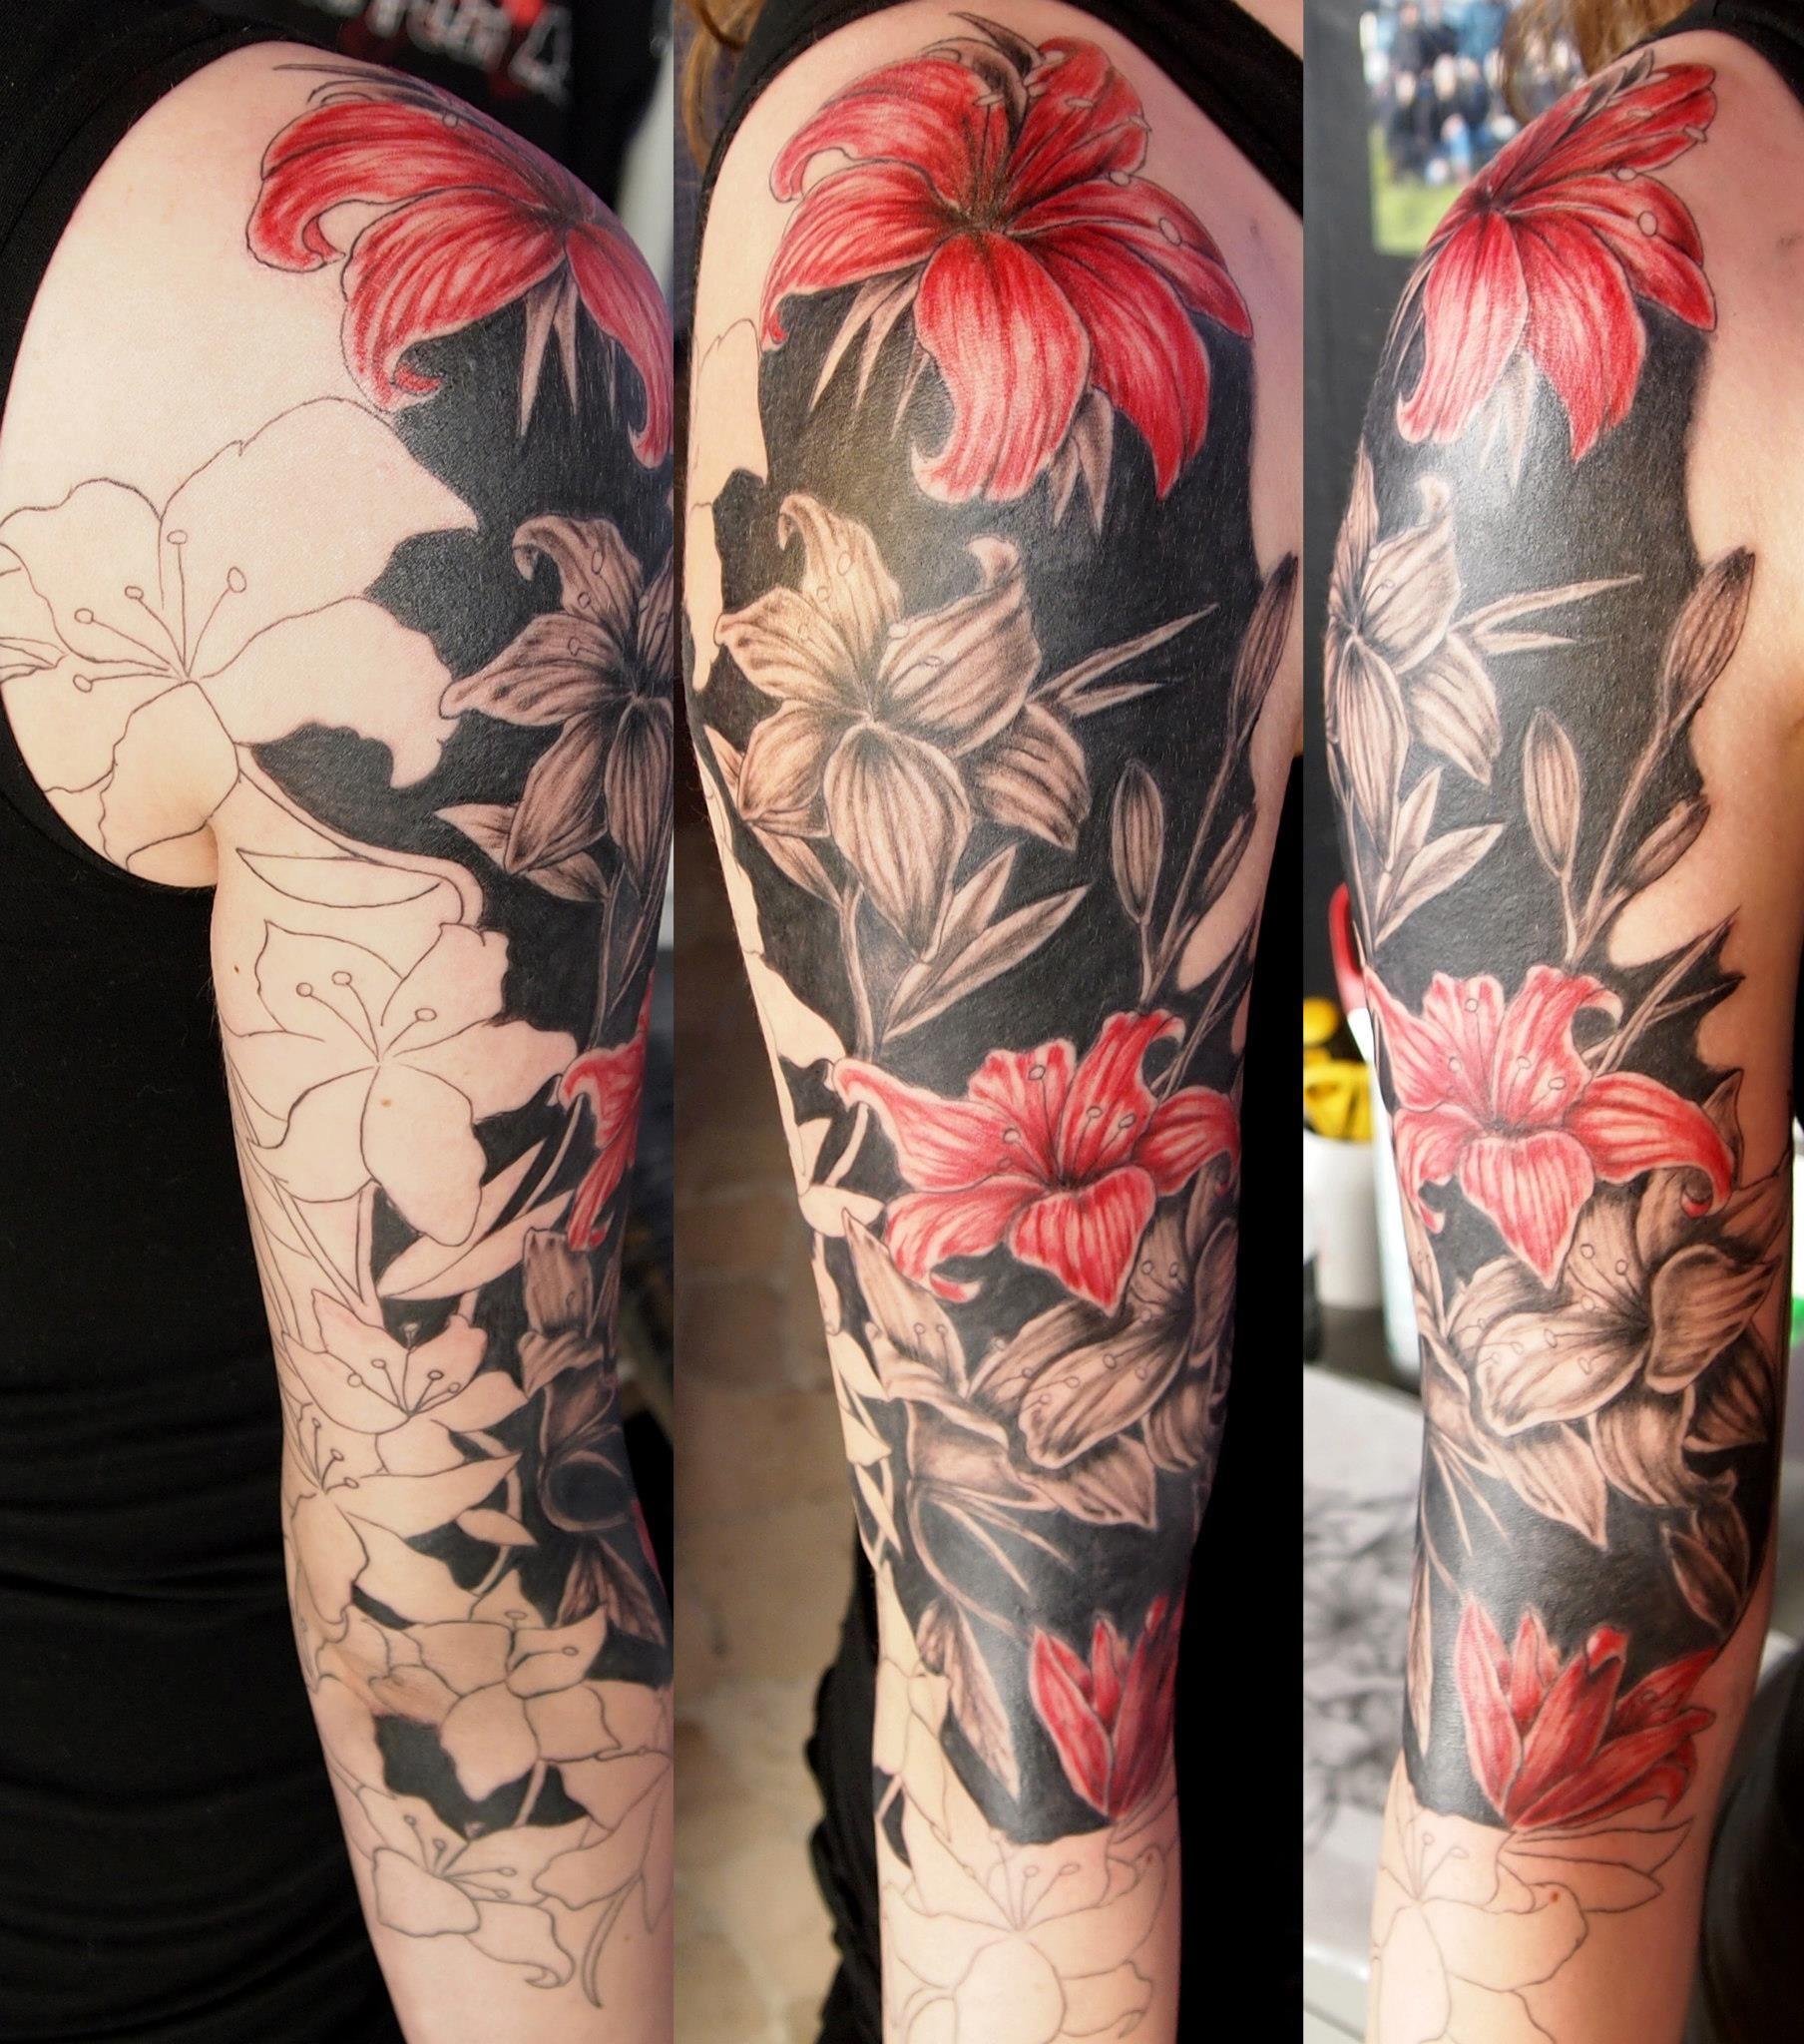 tattoo, ink, tattoos, body, image, photo, tatuaggi, skin